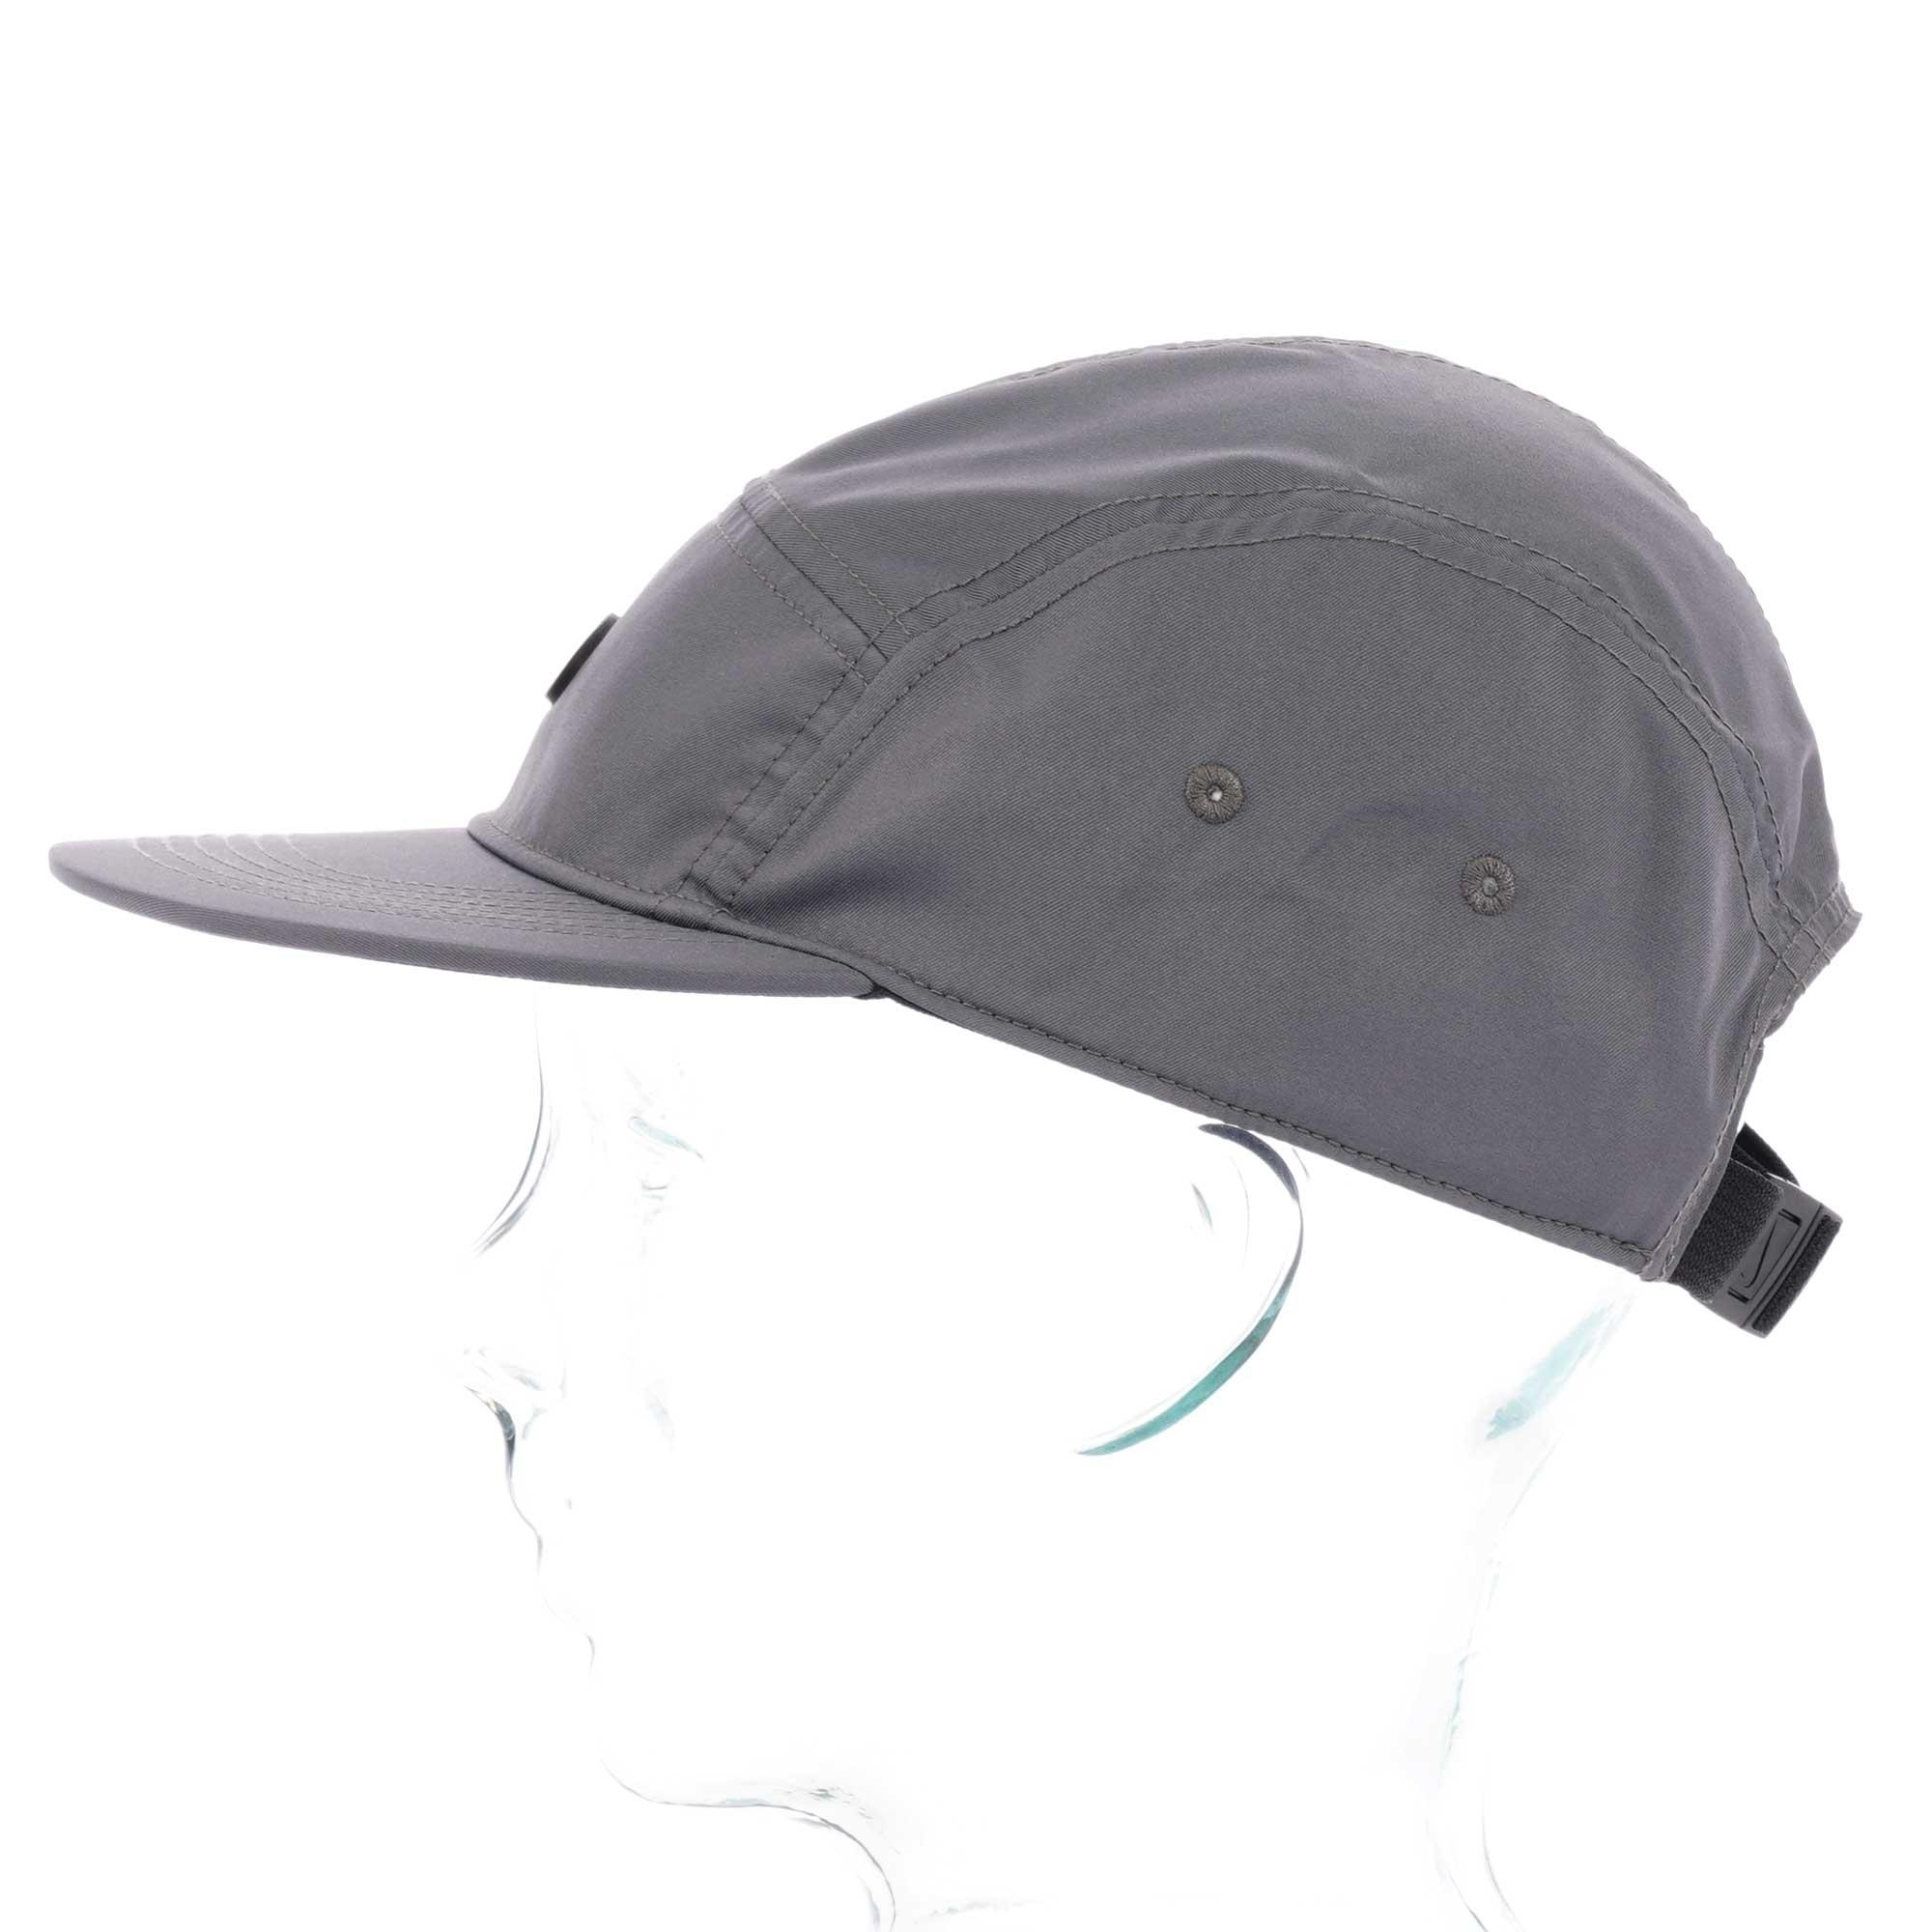 d6ce90acbe287 Nike - Gray Air Max Aw84 Cap - Grey for Men - Lyst. View fullscreen